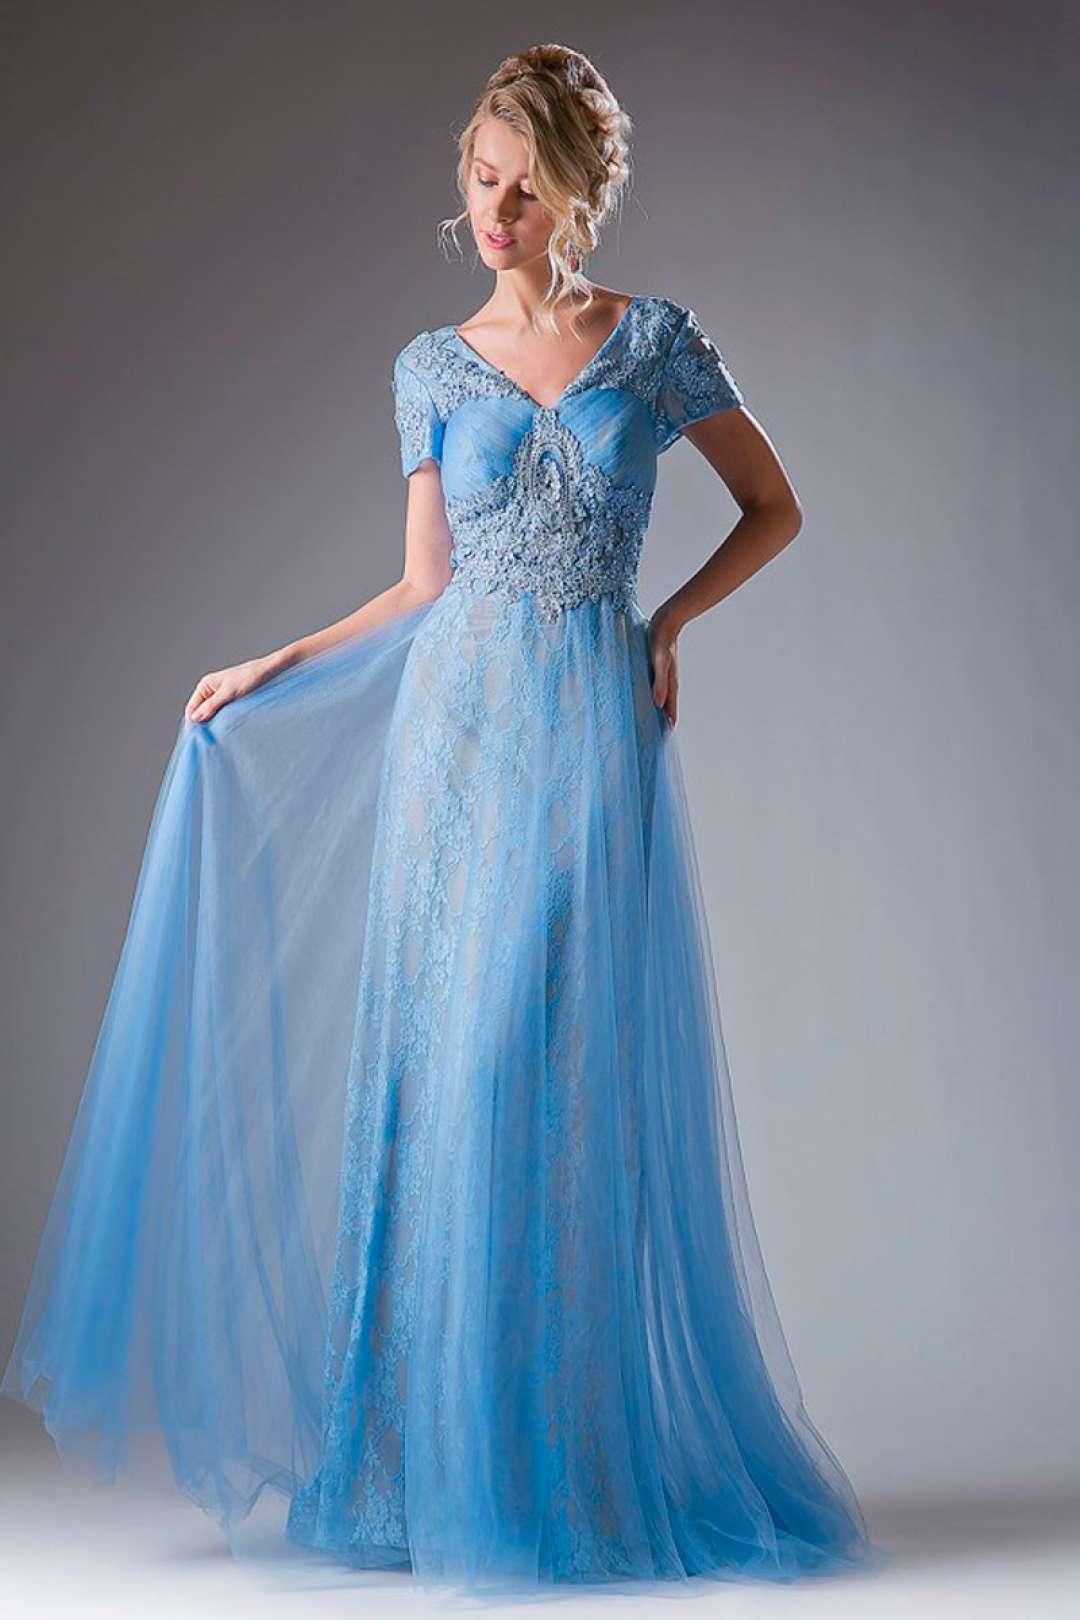 Cinderella Design